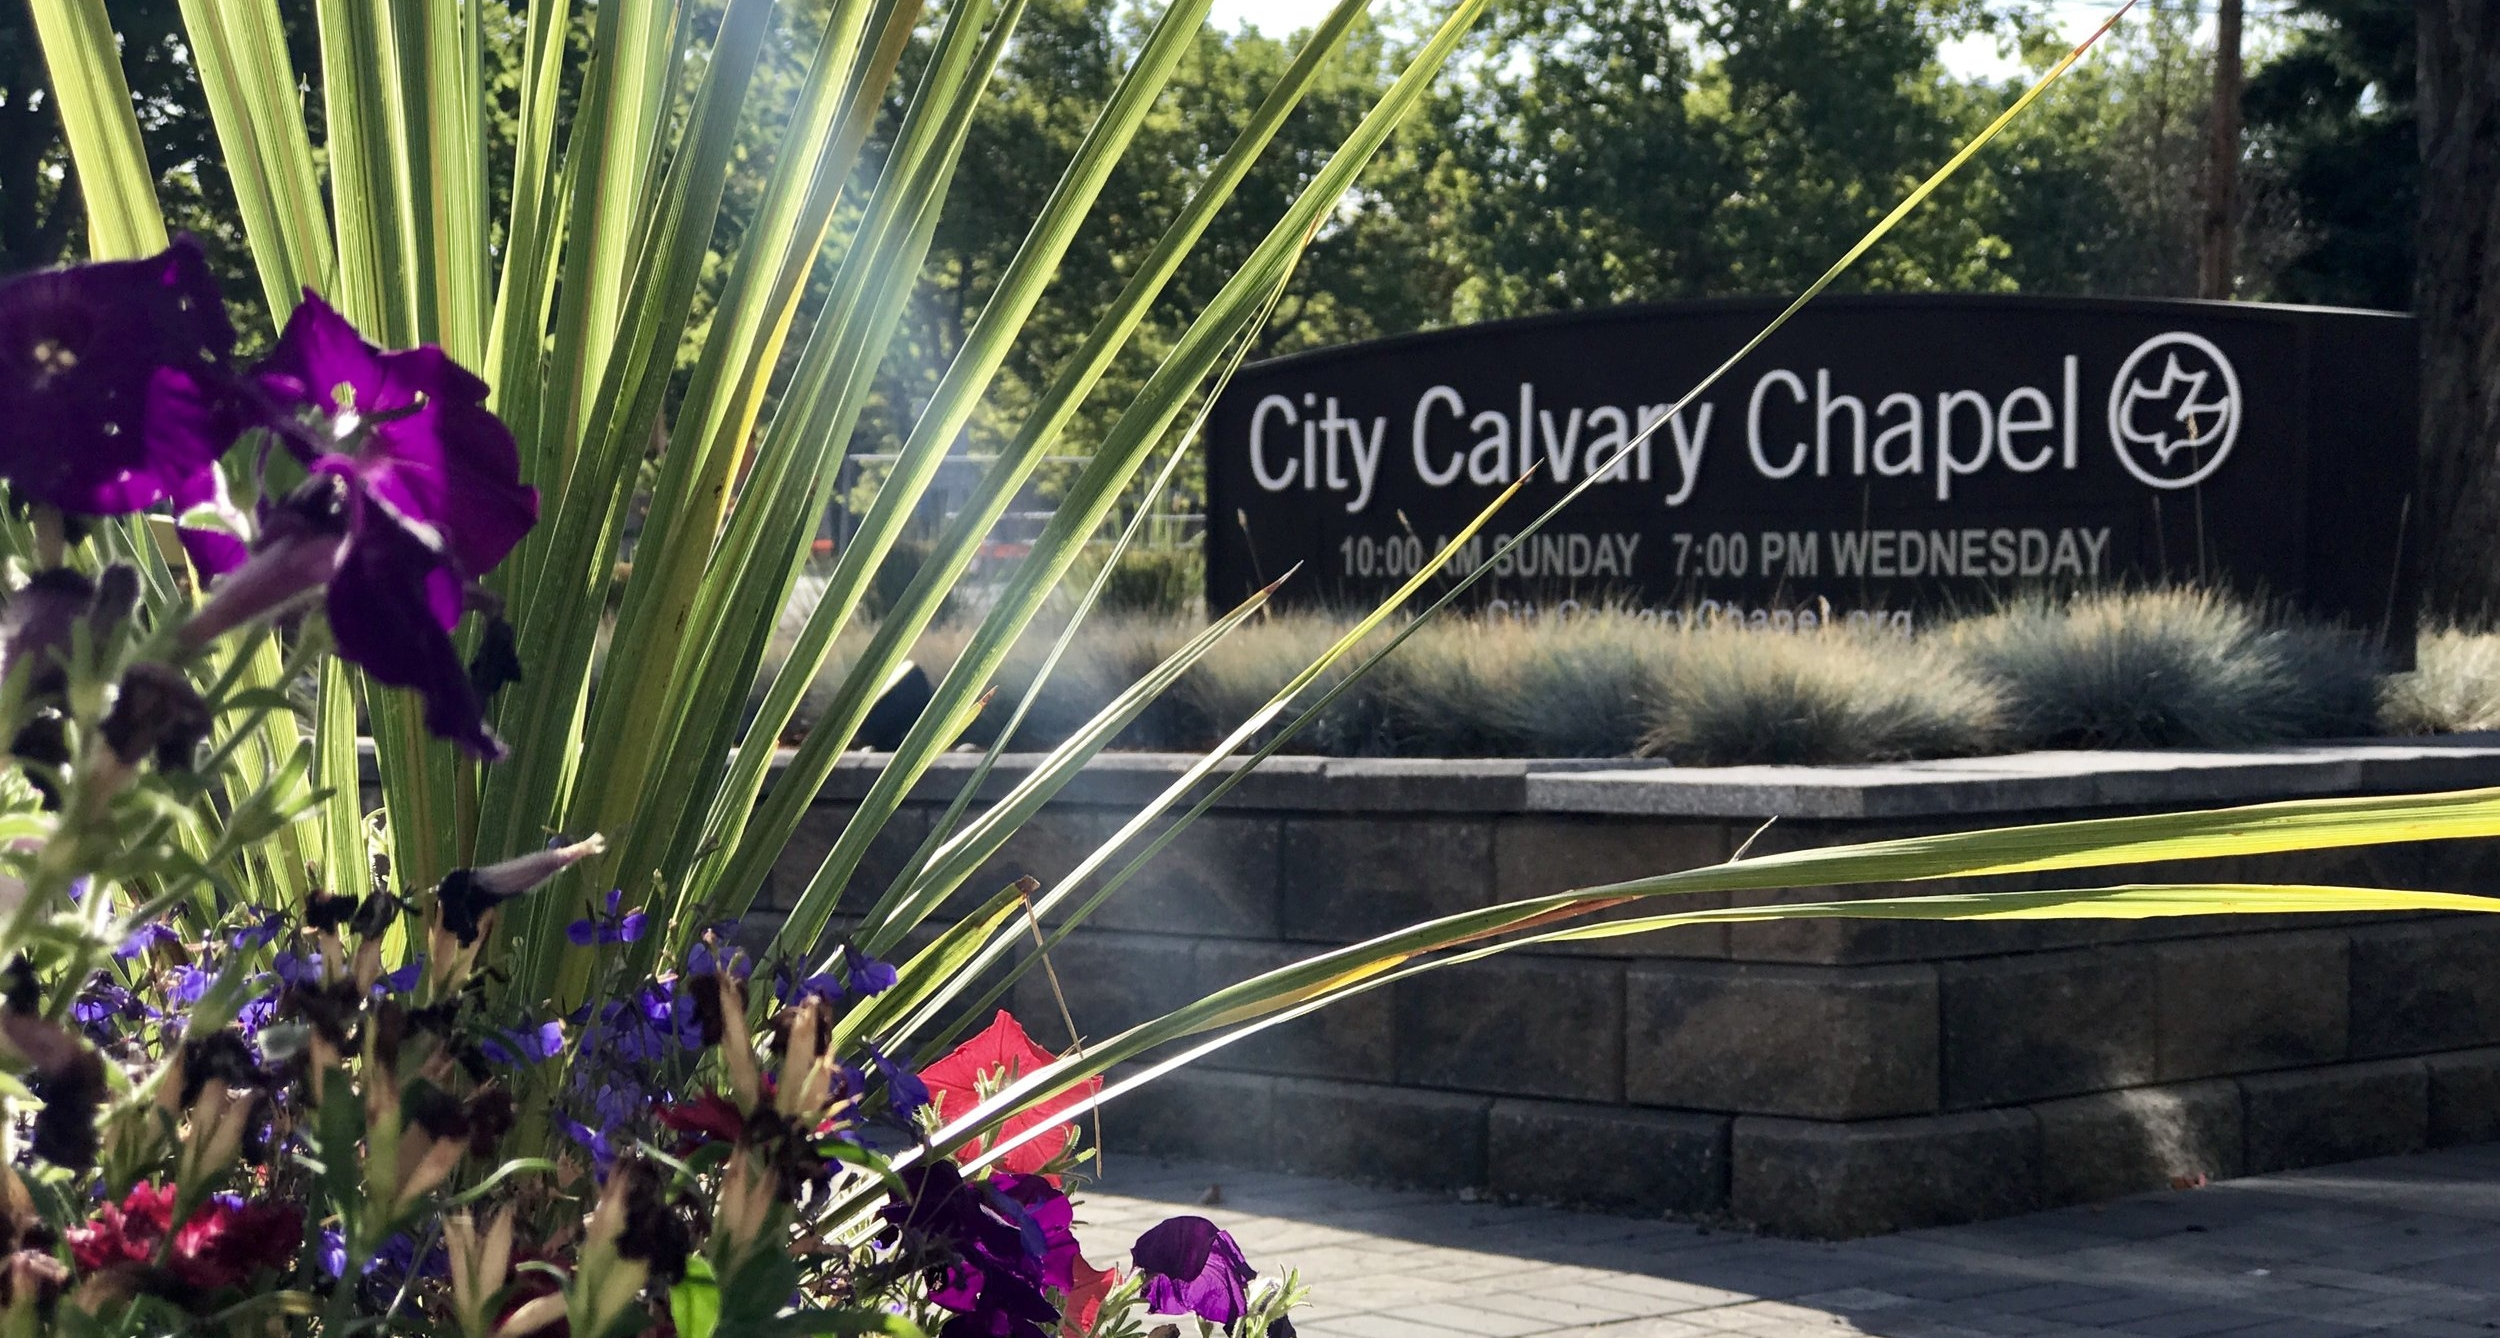 City Calvary Chapel - We Gather, Grow, & GoSundays at 10:00am & Wednesdays at 7:00pm